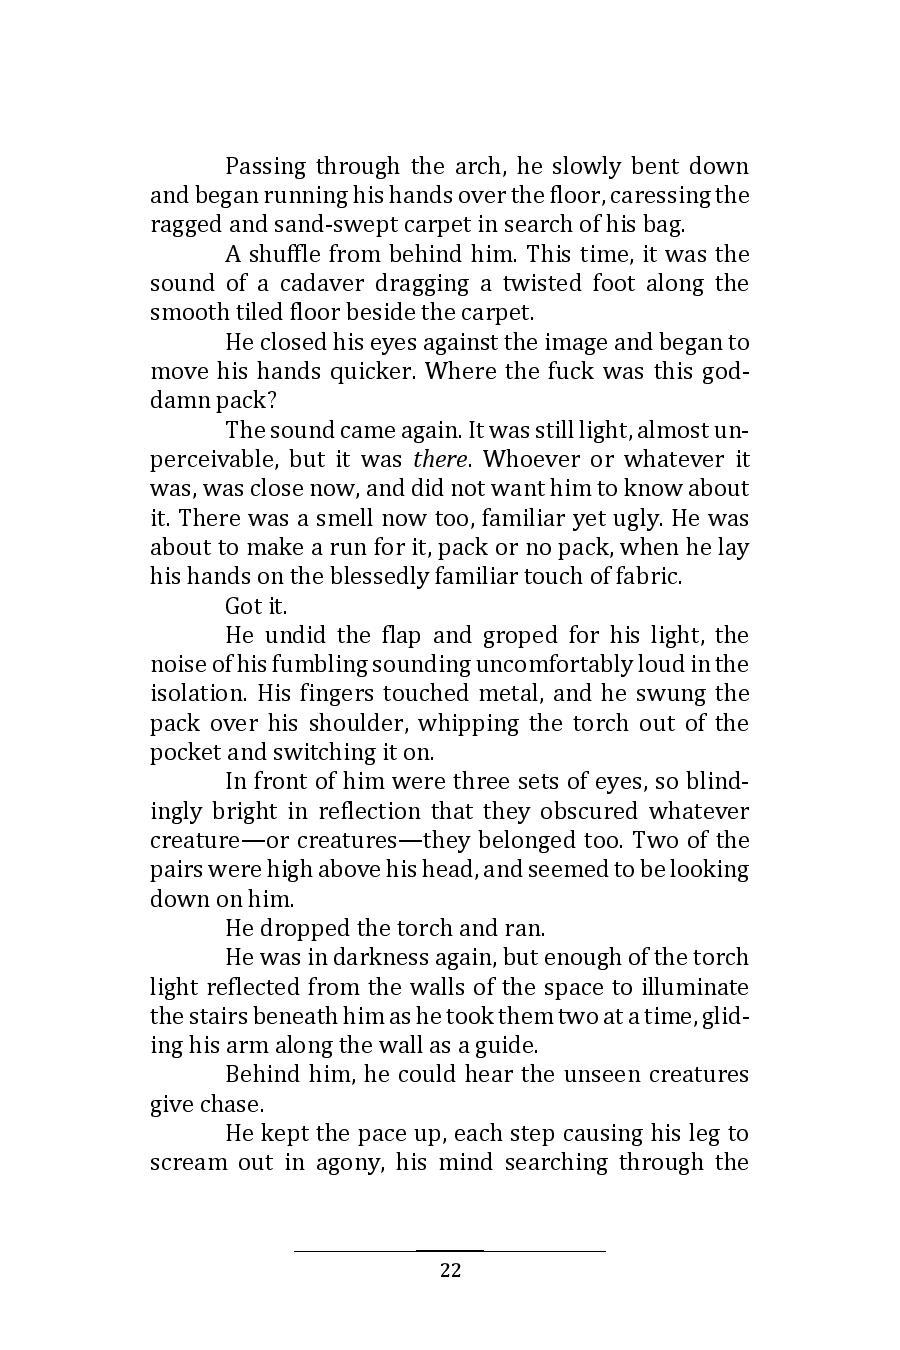 Hinnom Magazine 001 Manuscript 10-page-026